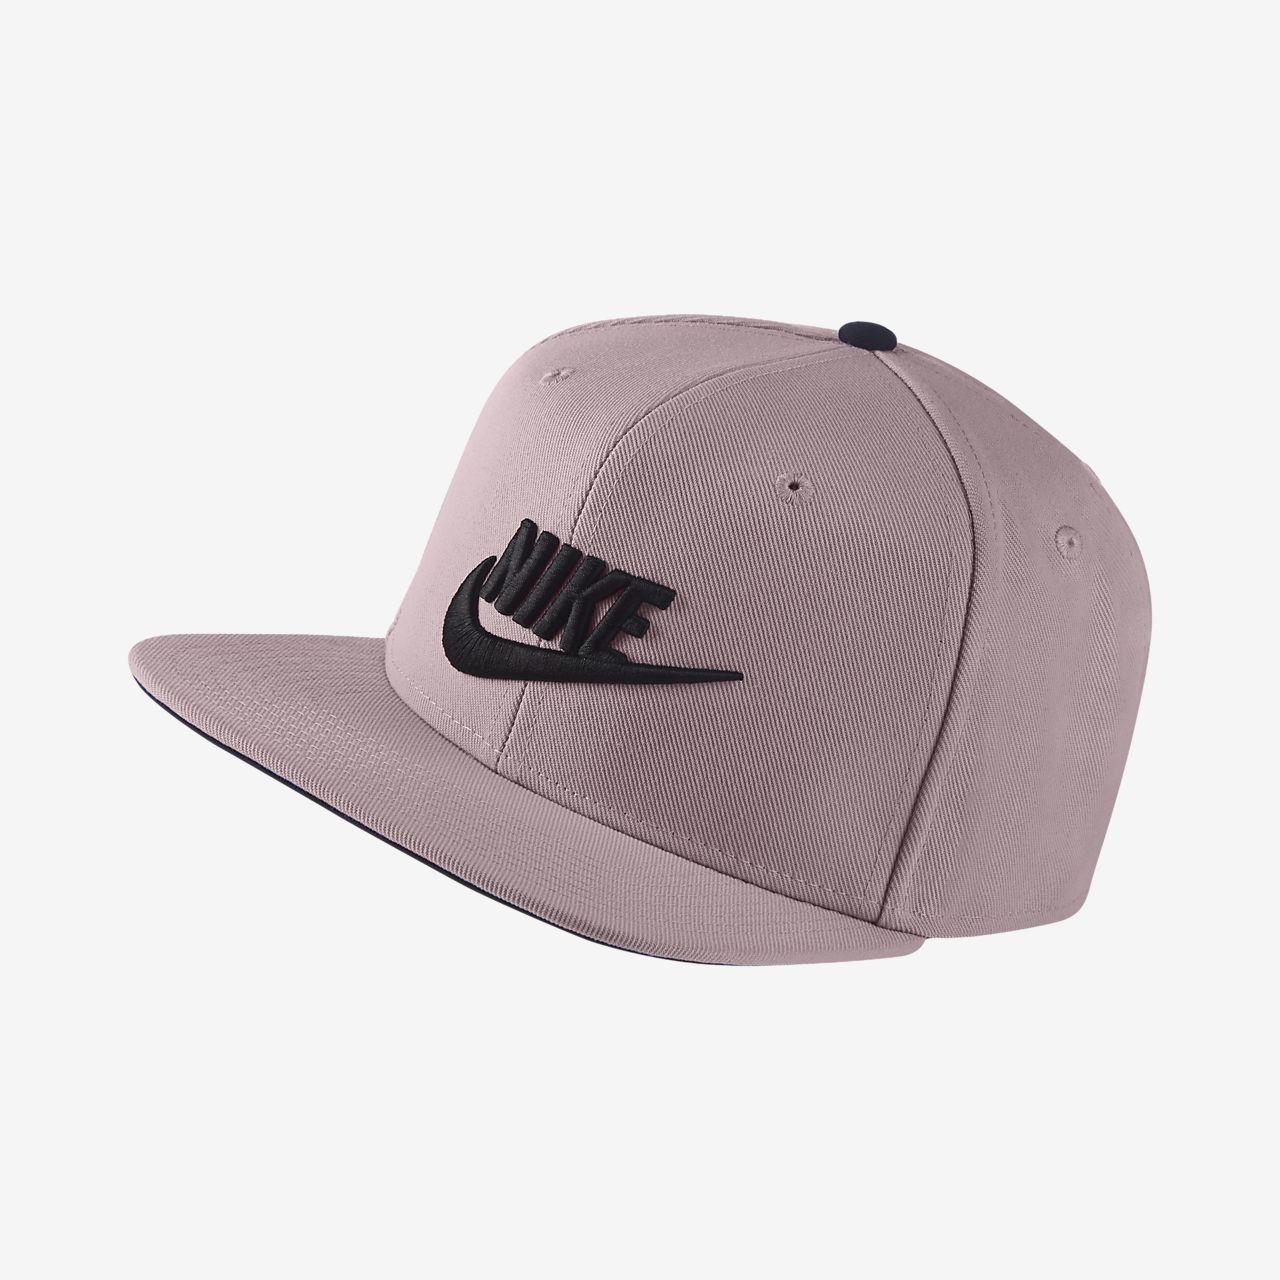 32f0c6a2 Nike Sportswear Pro Adjustable Hat. Nike.com MA